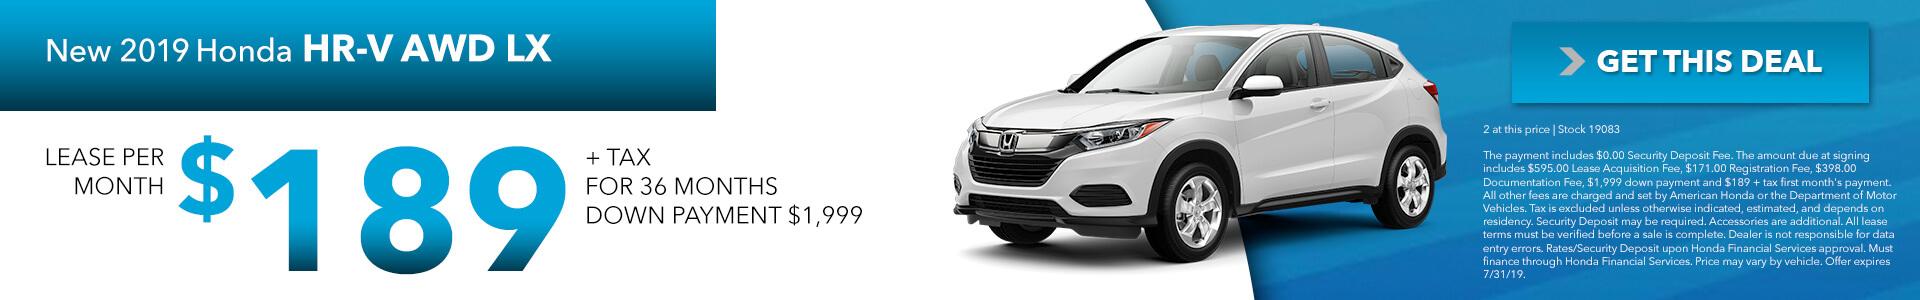 2019 Honda HR-V LX AWD  $189 per month